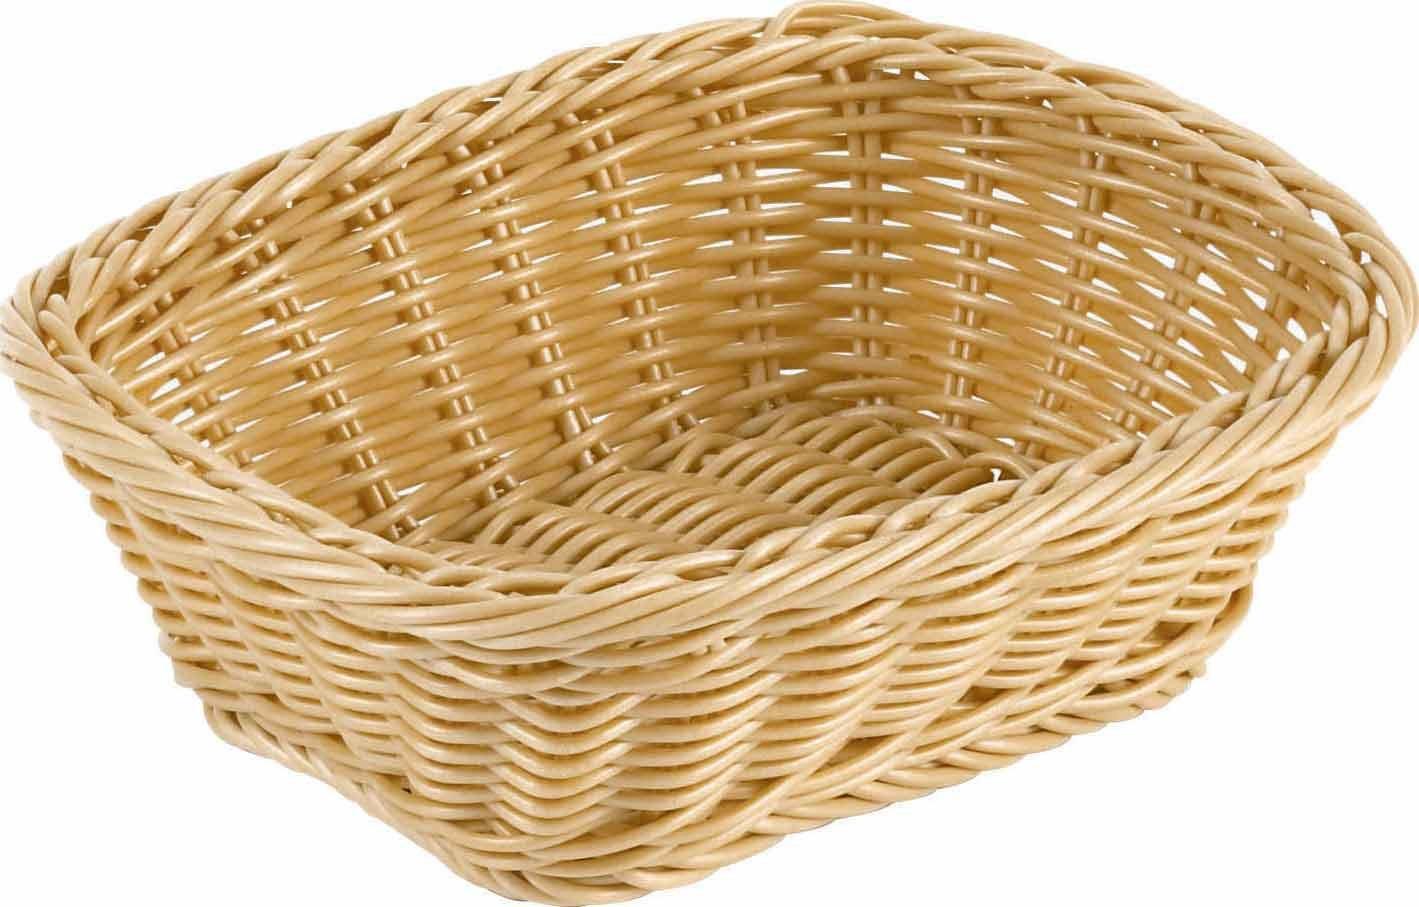 World Cuisine Rectangular Polyrattan Bread Basket L 16.125 X W 11.375 X H 2.75 42947-40